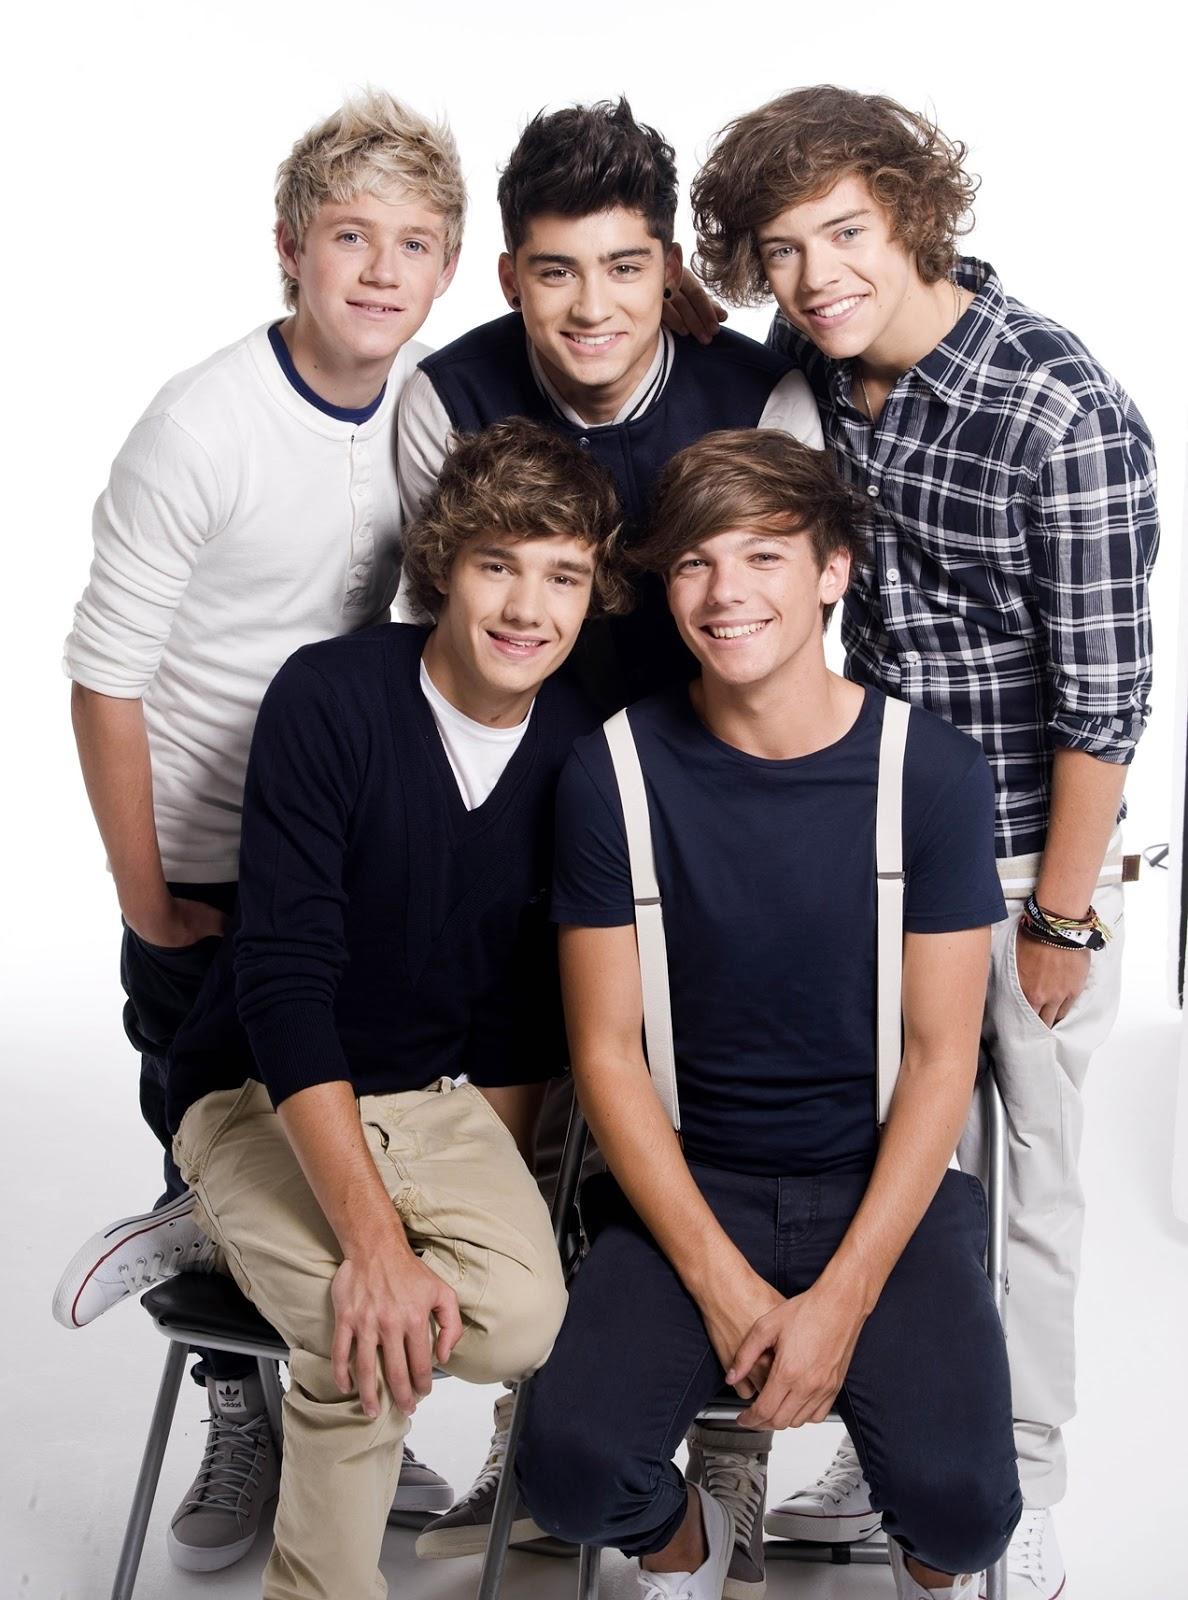 One Direction 2011 Photoshoot : direction, photoshoot, Direction:, Unseen, Photos, Their, Photoshoot, (2011)